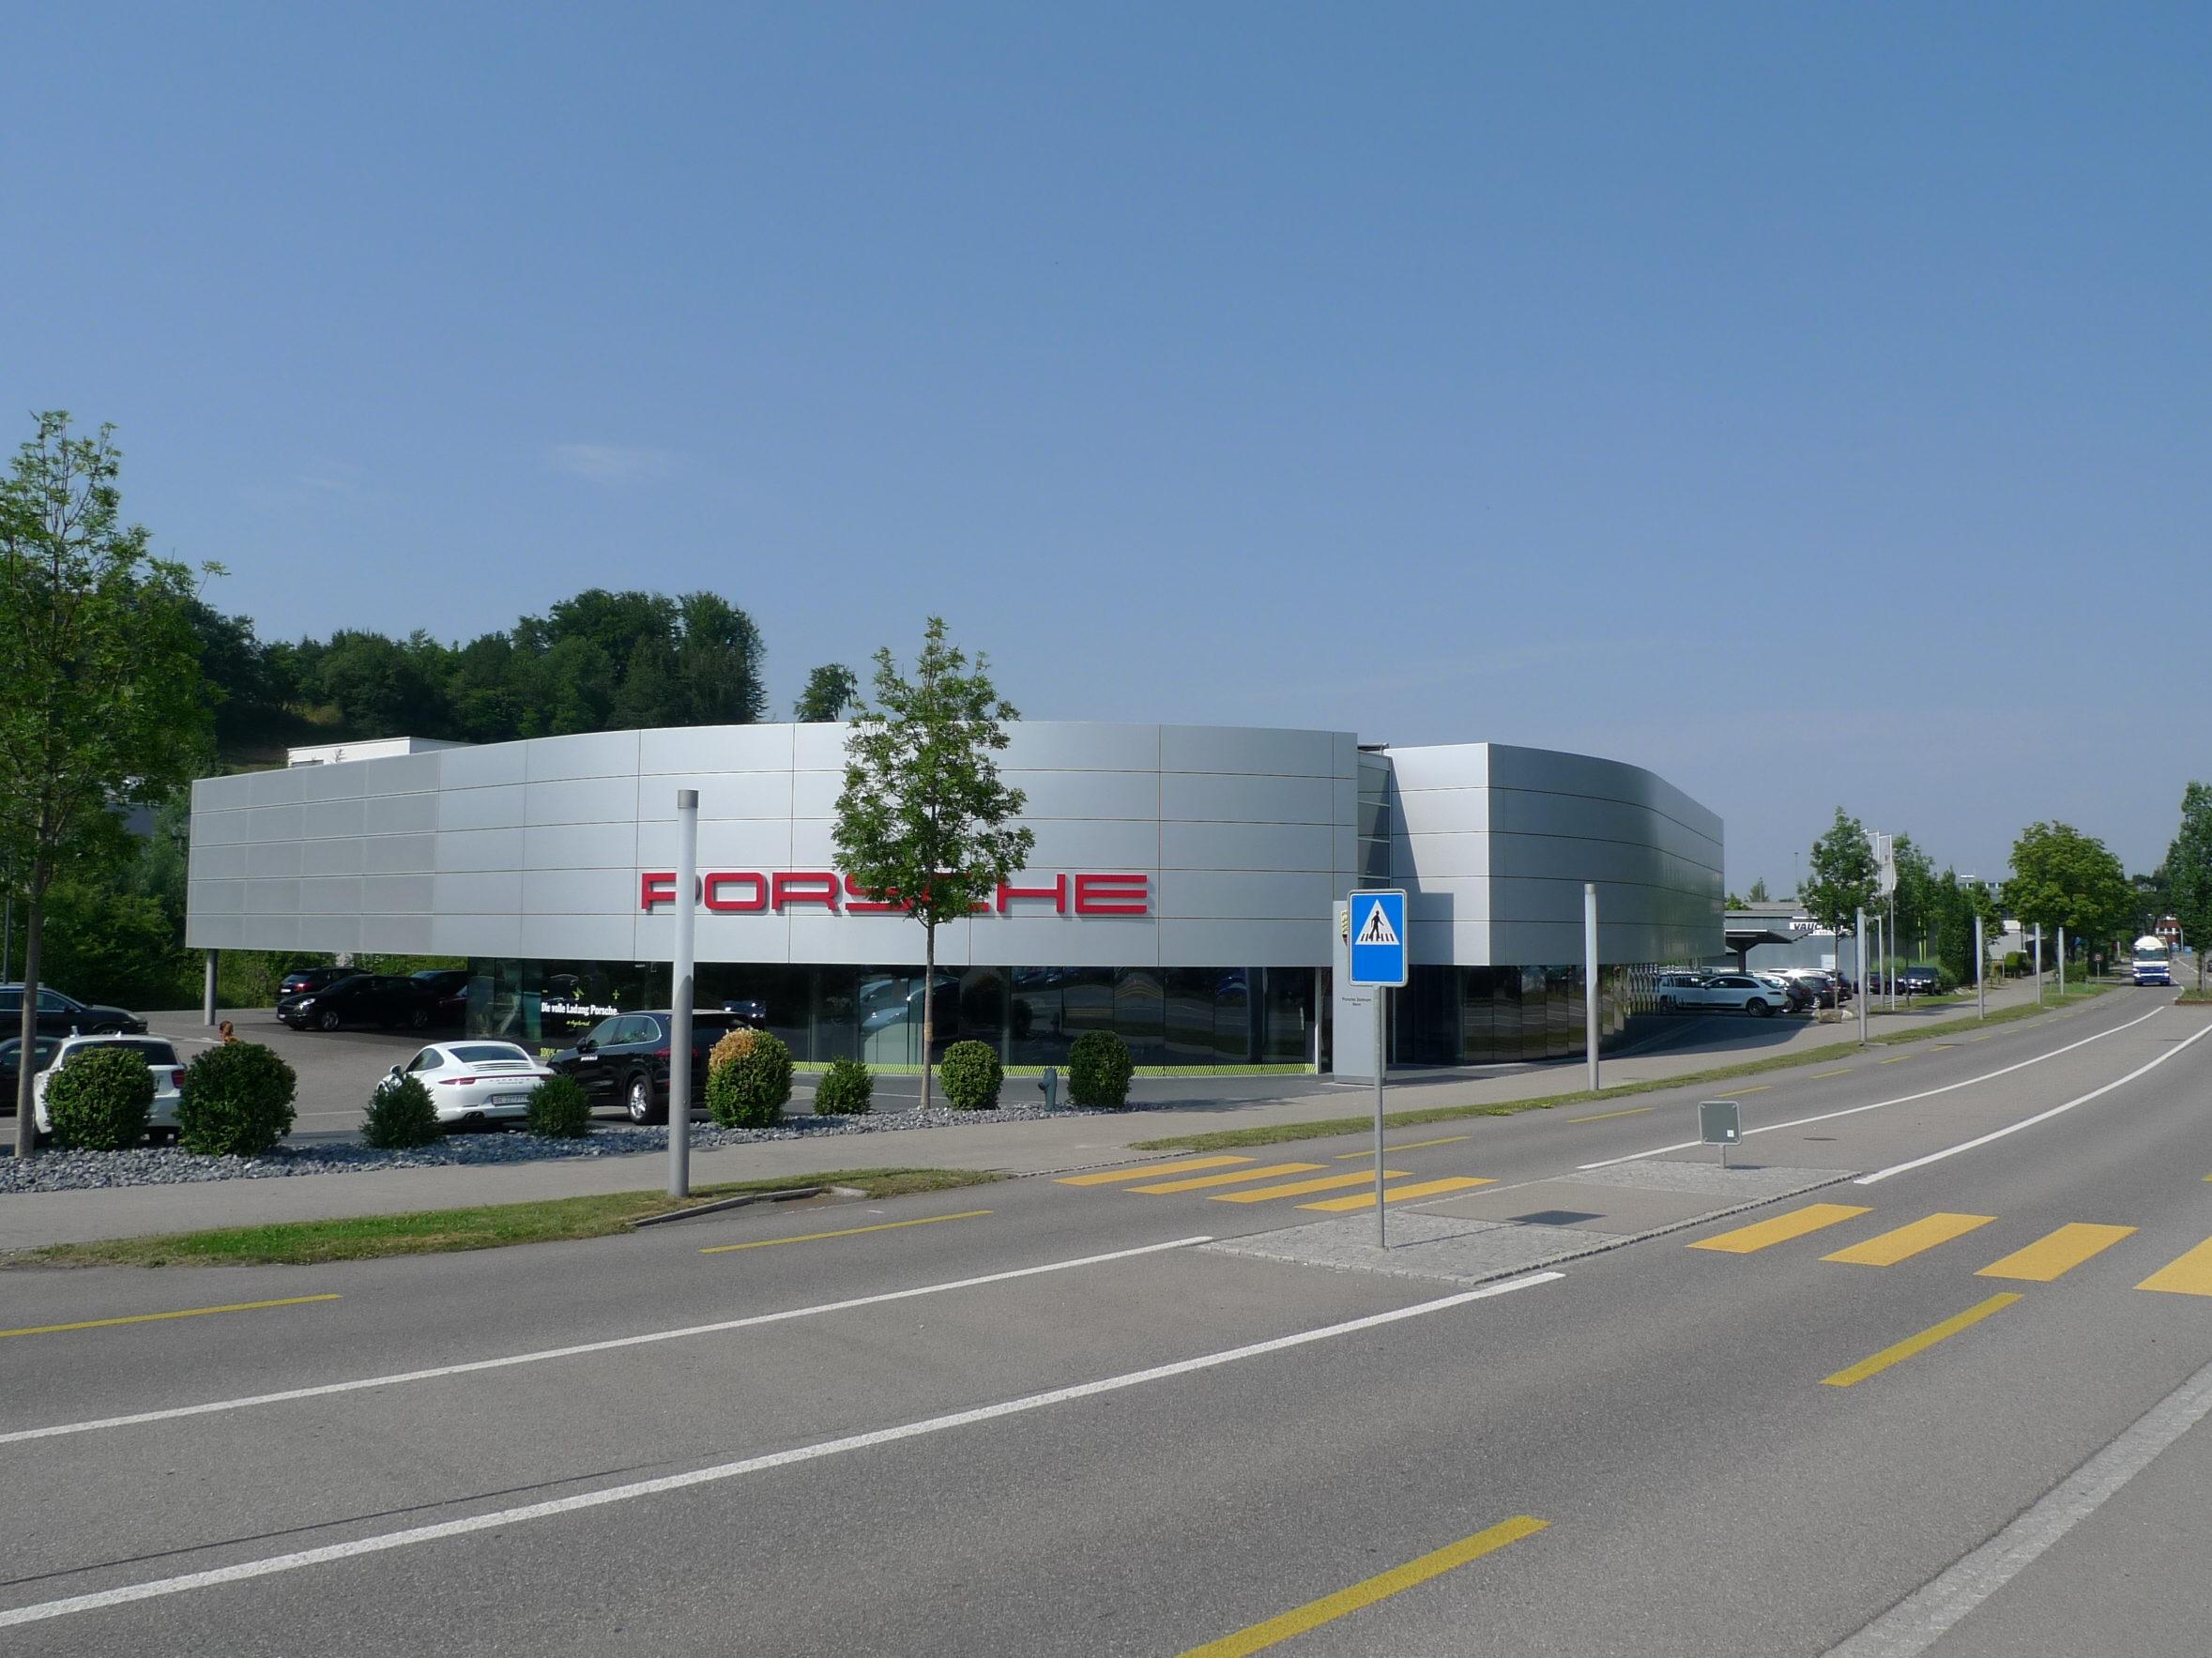 Porsche-Zentrum-scaled-aspect-ratio-596-447